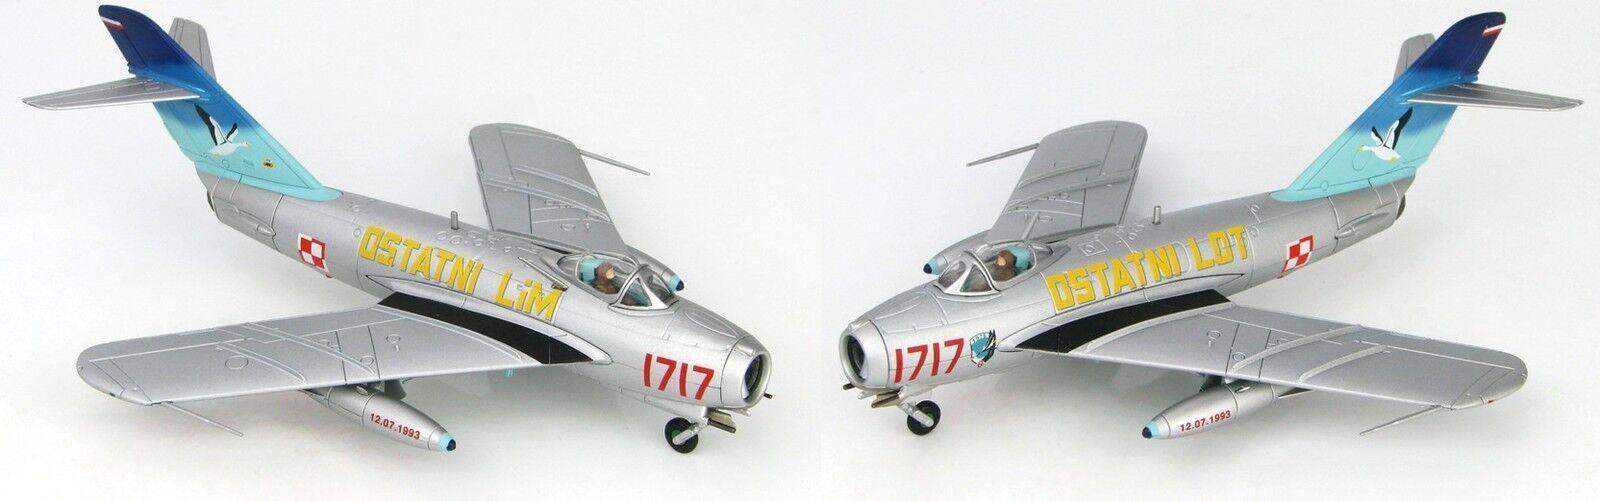 Hobby Master 1:72 LIM-5 MIG-17 Polish AF 45th Experimental Sqn rosso 1717 HA5905